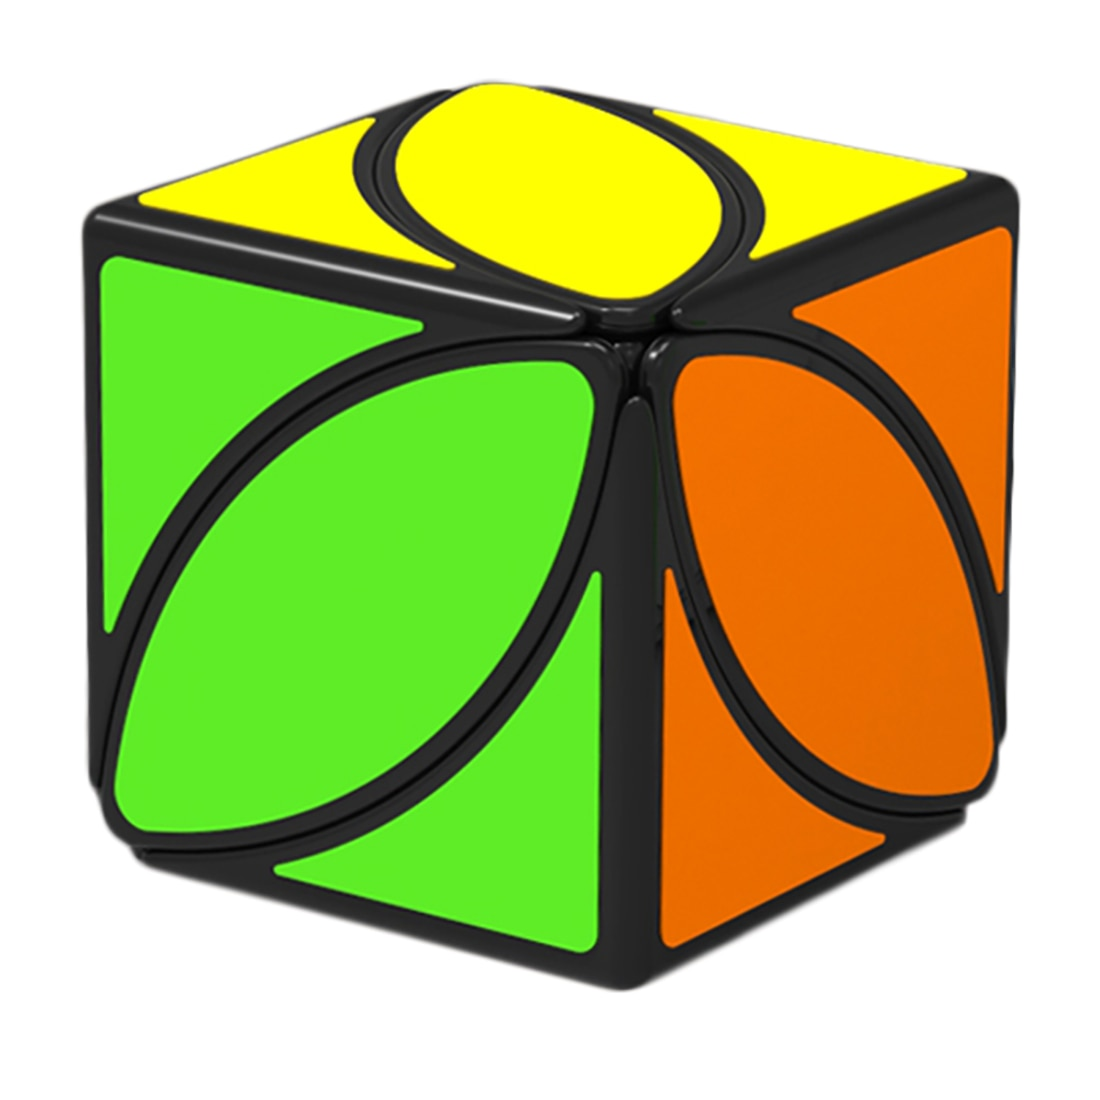 QiYi Cube Mofangge Ivy Cube Fengye Twist Cube of Leaf Line White Color Puzzle Magic Cube Educational Toys cubo magico gift